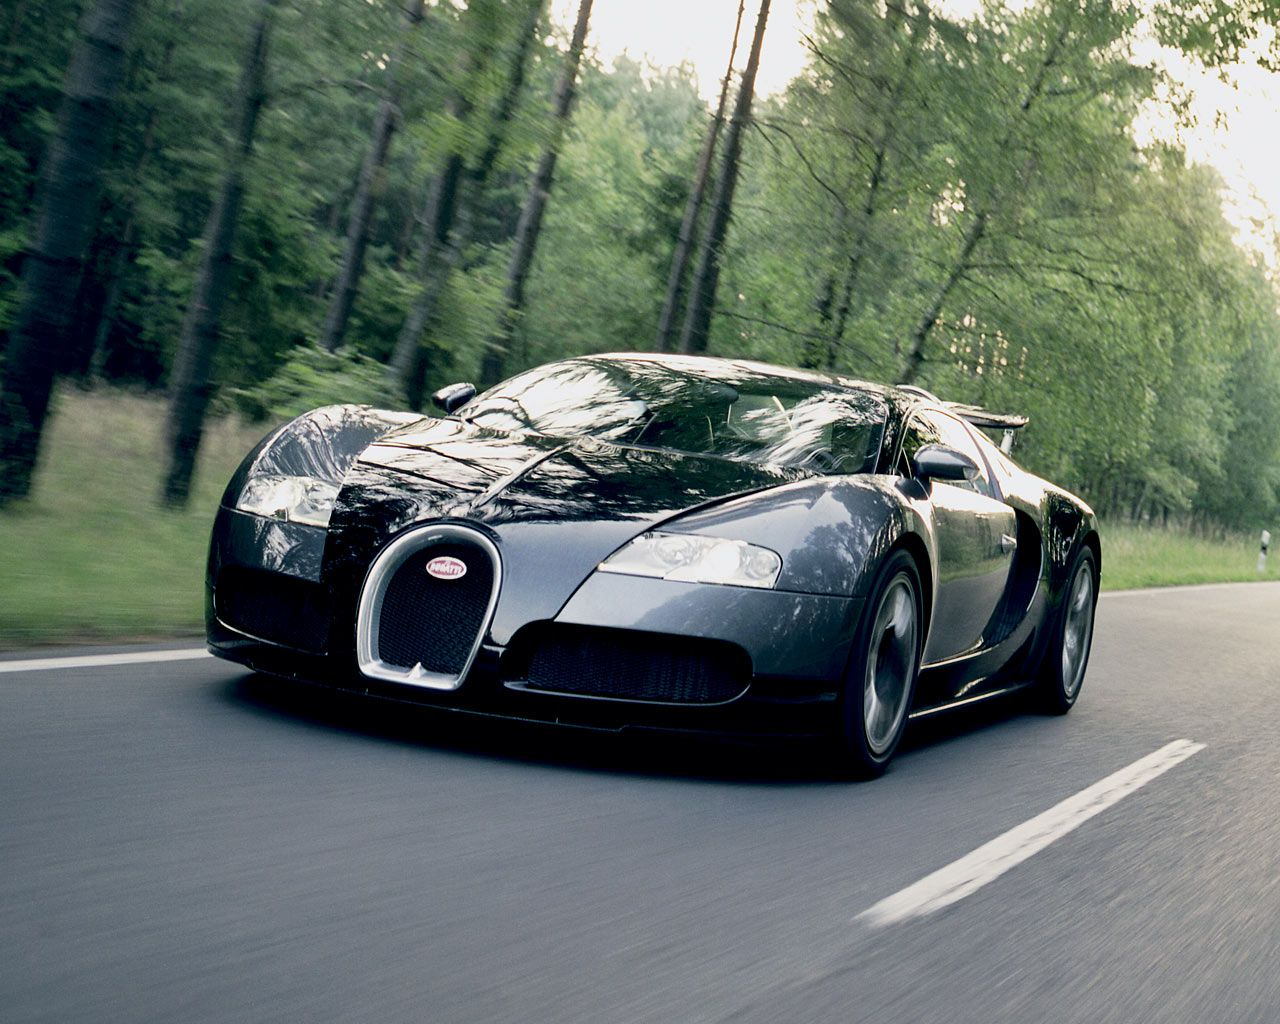 Bugatti Pics And Wallpapers Amazing Cars Cars De Disney Car Wallpapers